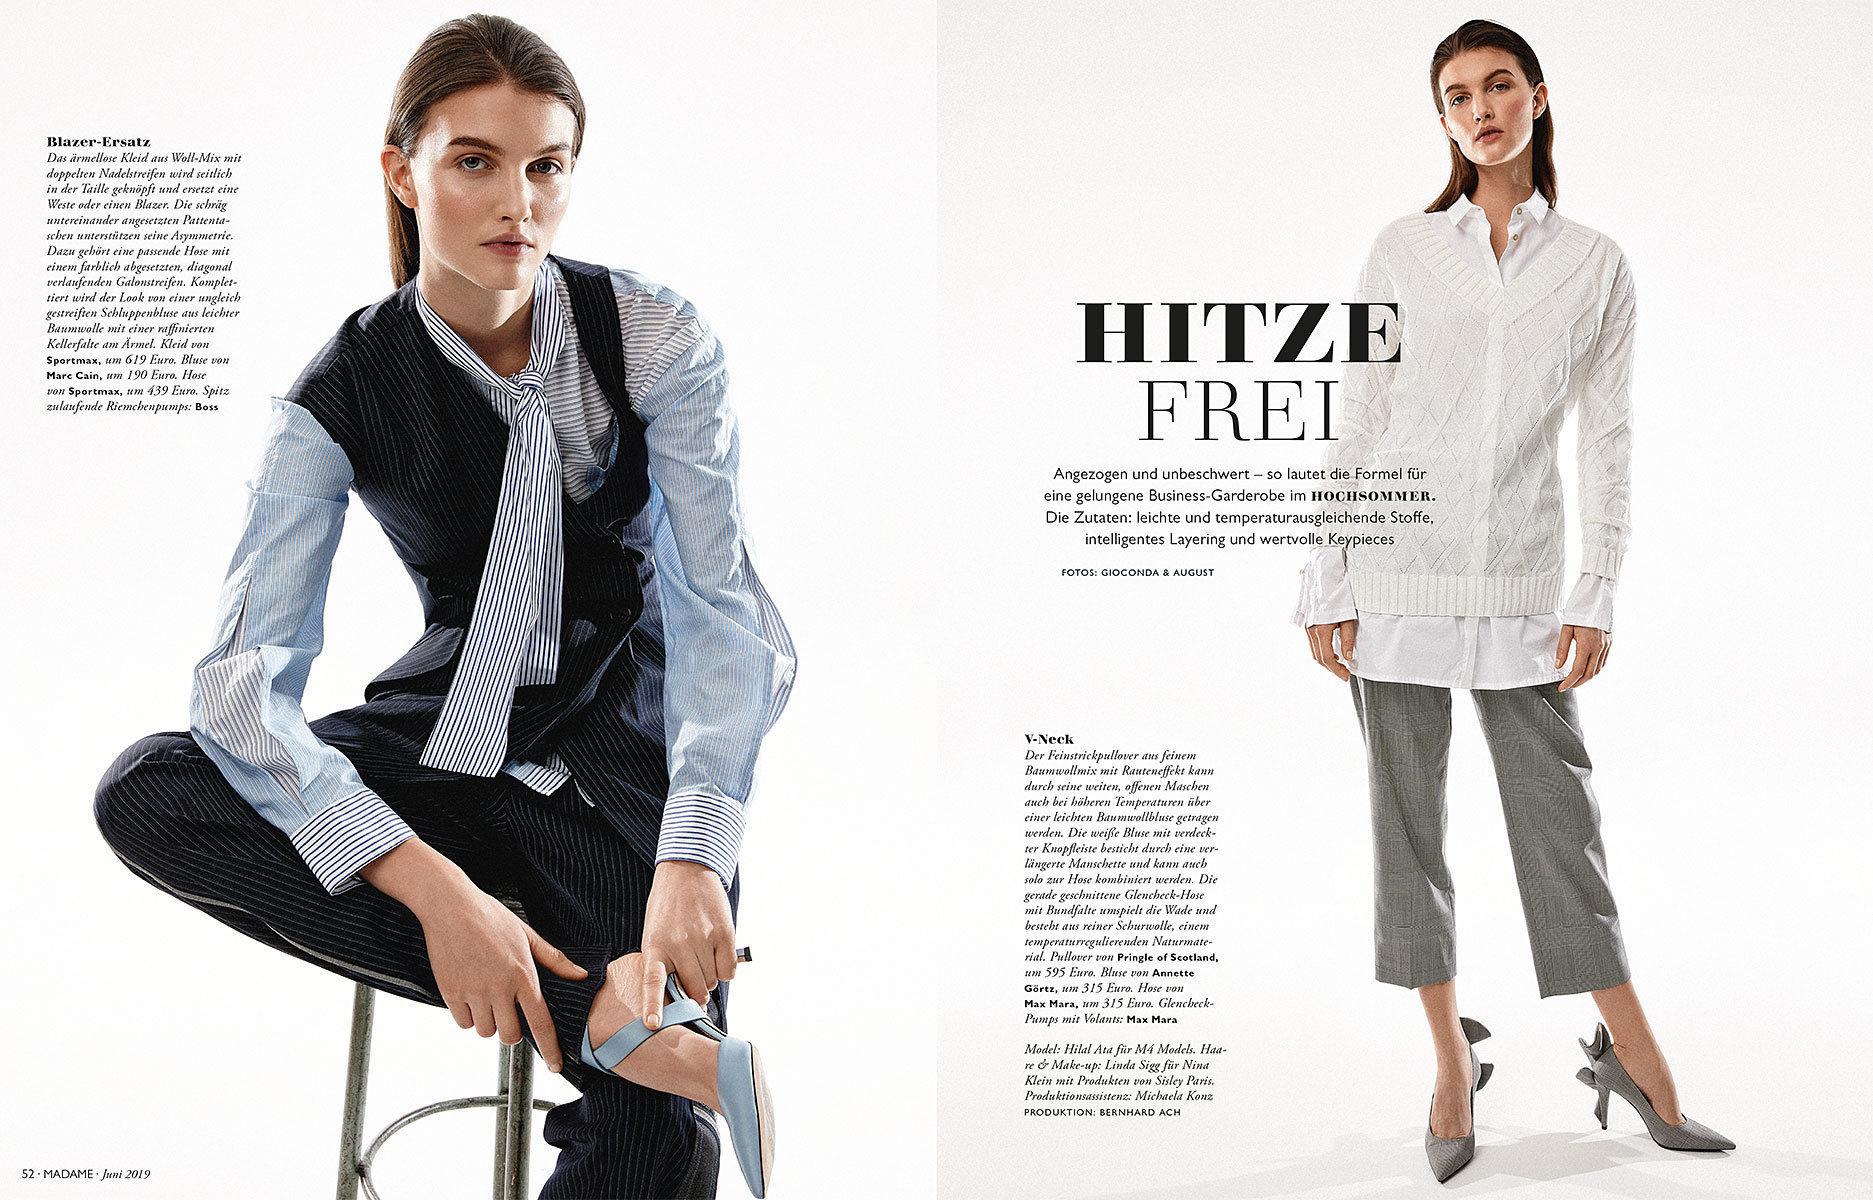 Linda Sigg /co NINA KLEIN for Madame Magazine